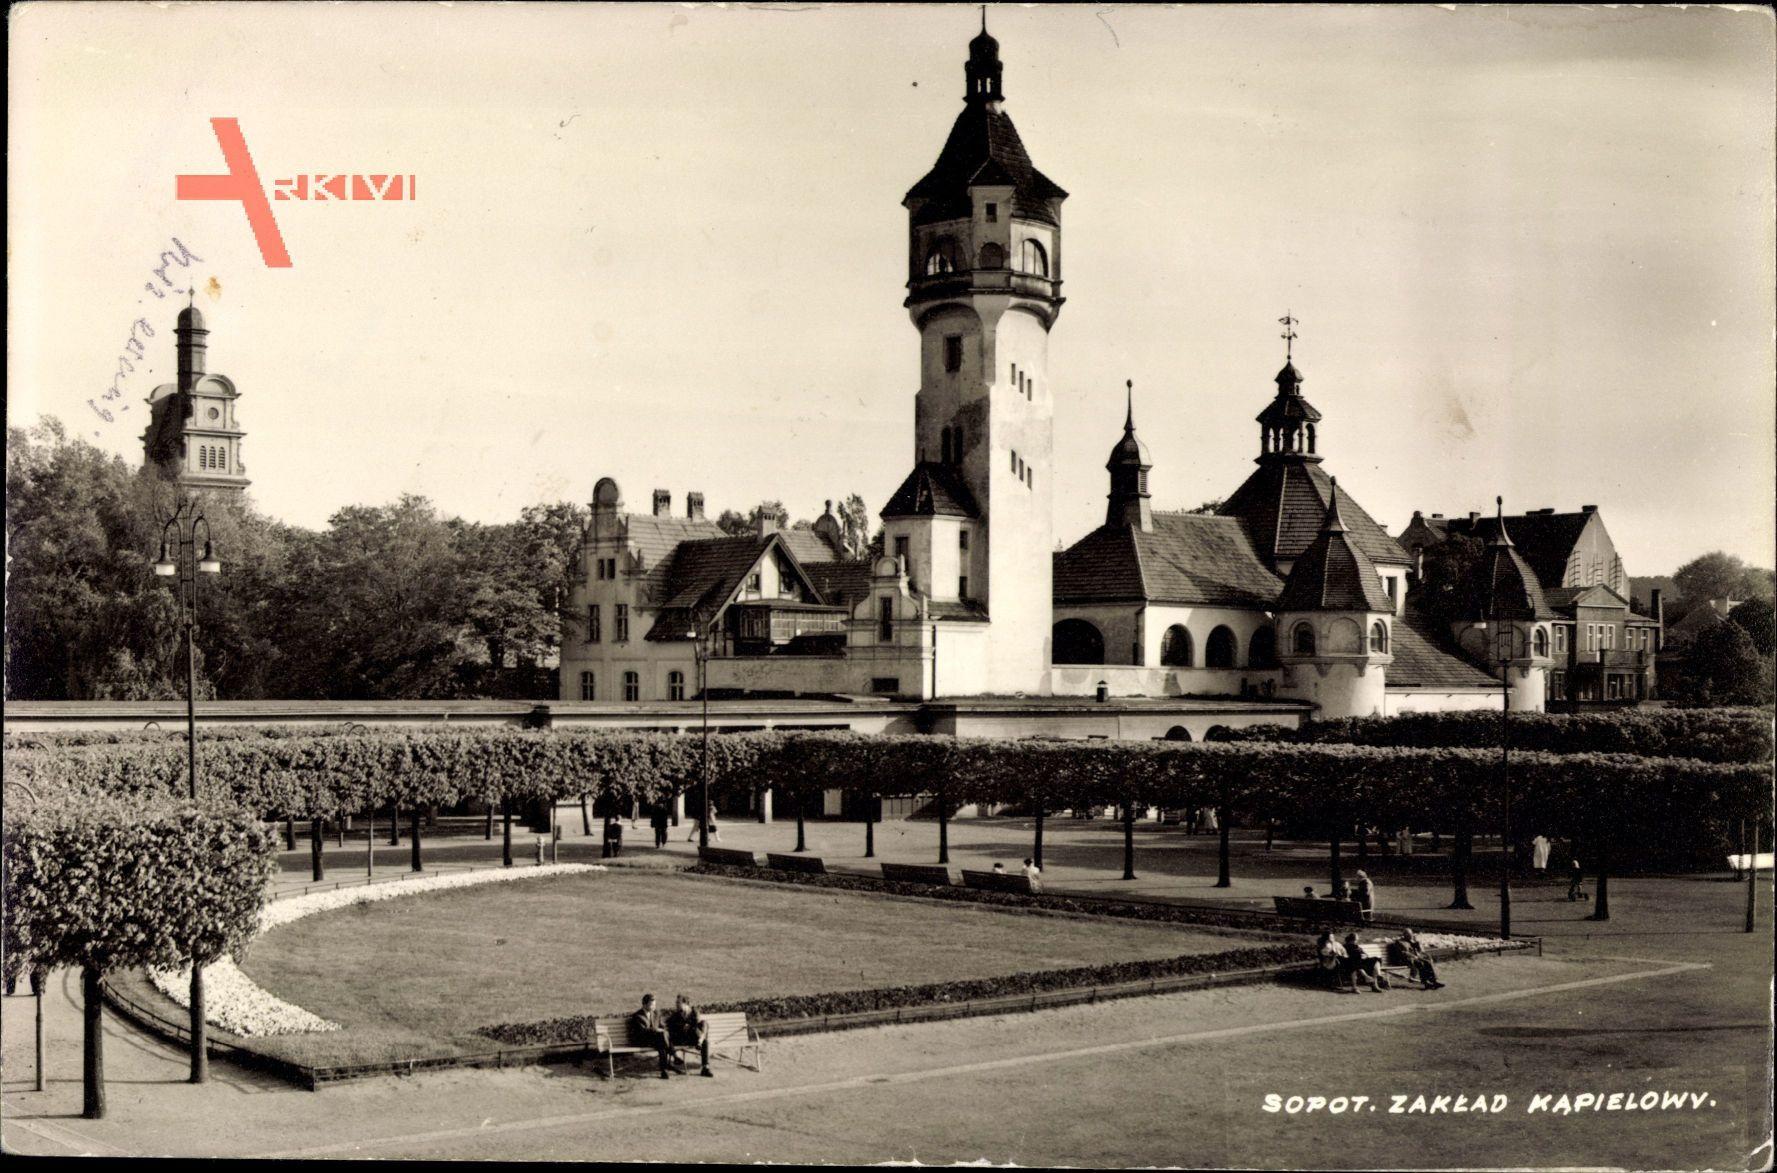 Sopot Gdańsk Zoppot Danzig, Zaklad Kapielowy, Badeanstalt